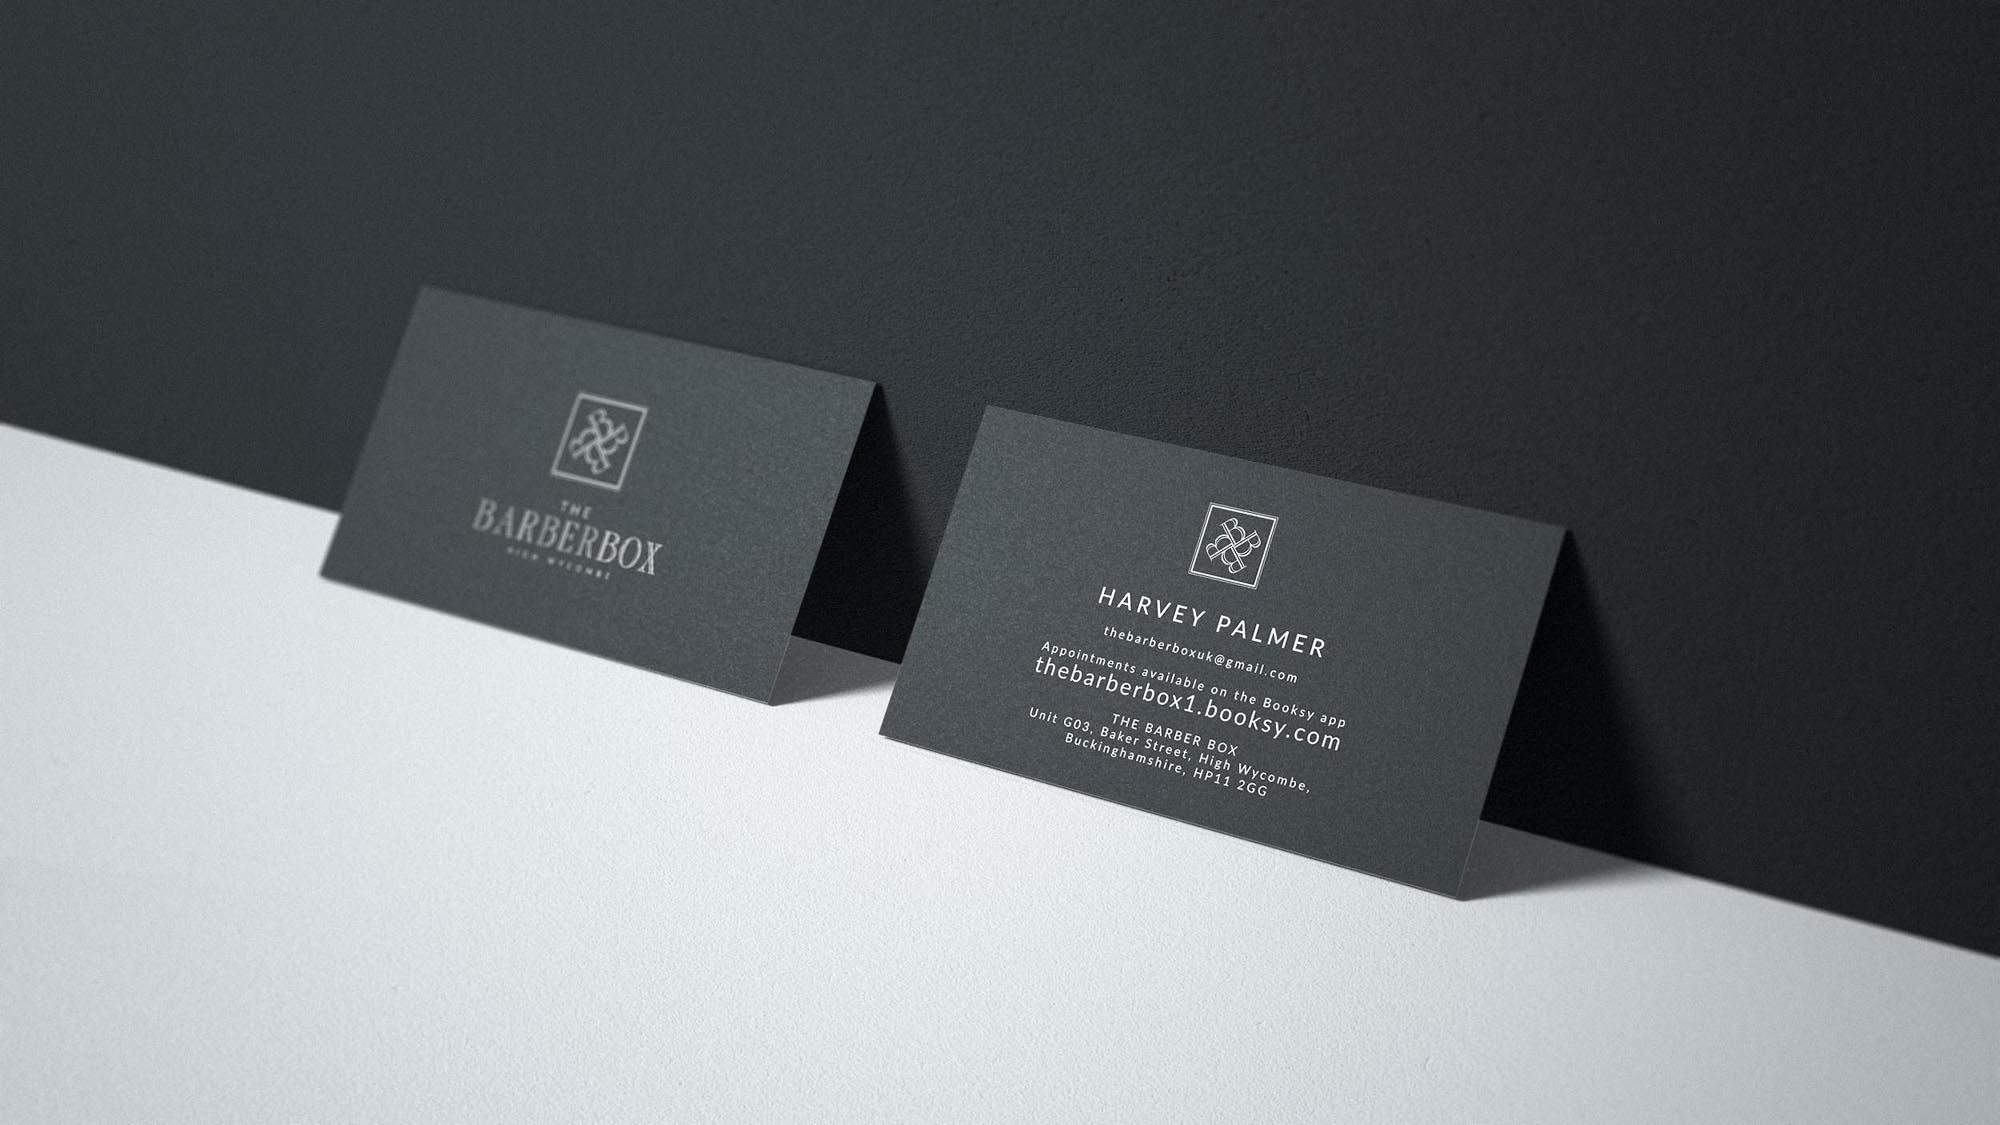 barberbox-logo-designer-london02